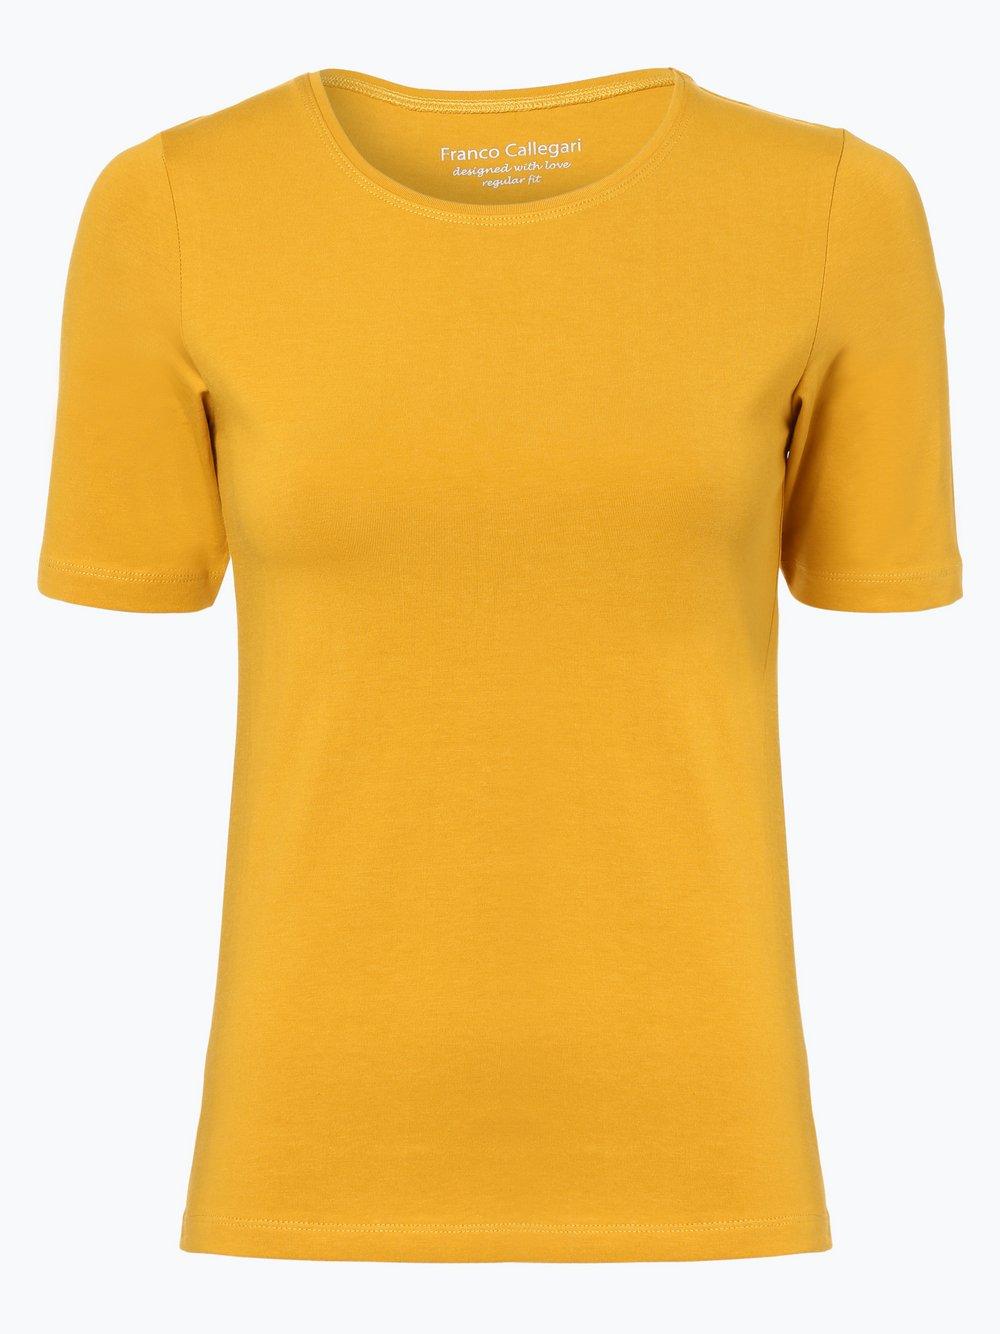 Franco Callegari - T-shirt damski, żółty